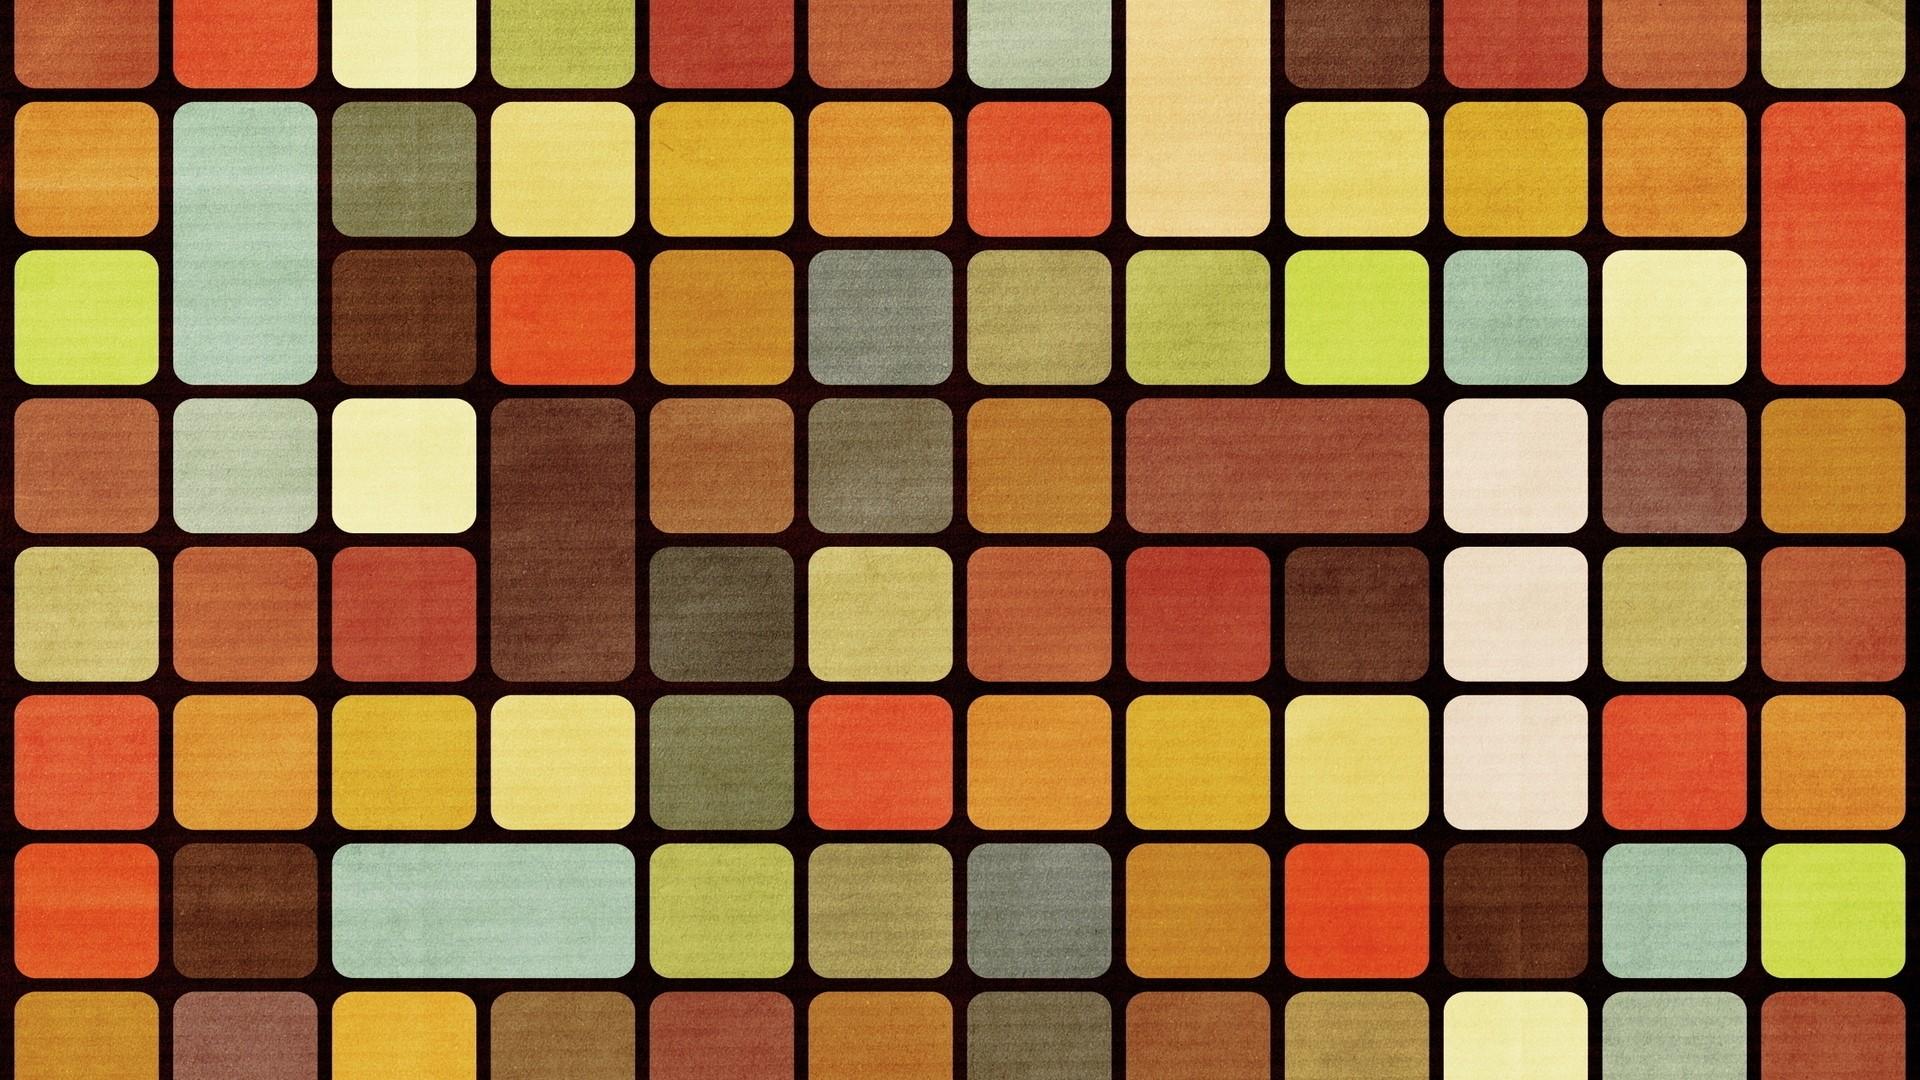 Tile HD Wallpaper